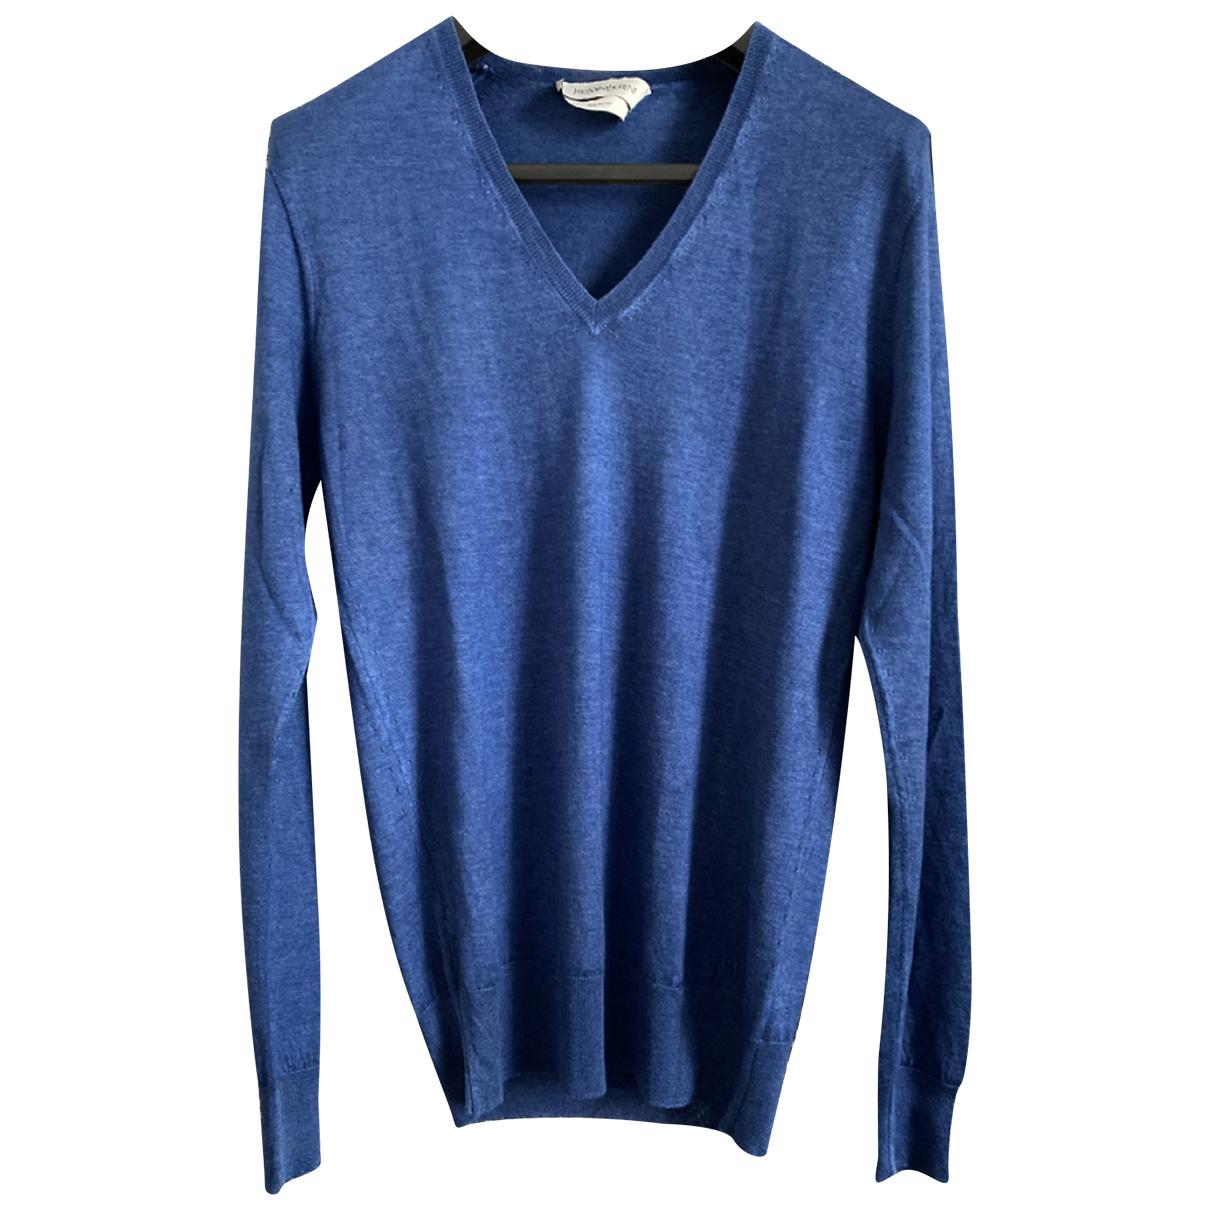 Yves Saint Laurent N Blue Wool Knitwear & Sweatshirts for Men L International